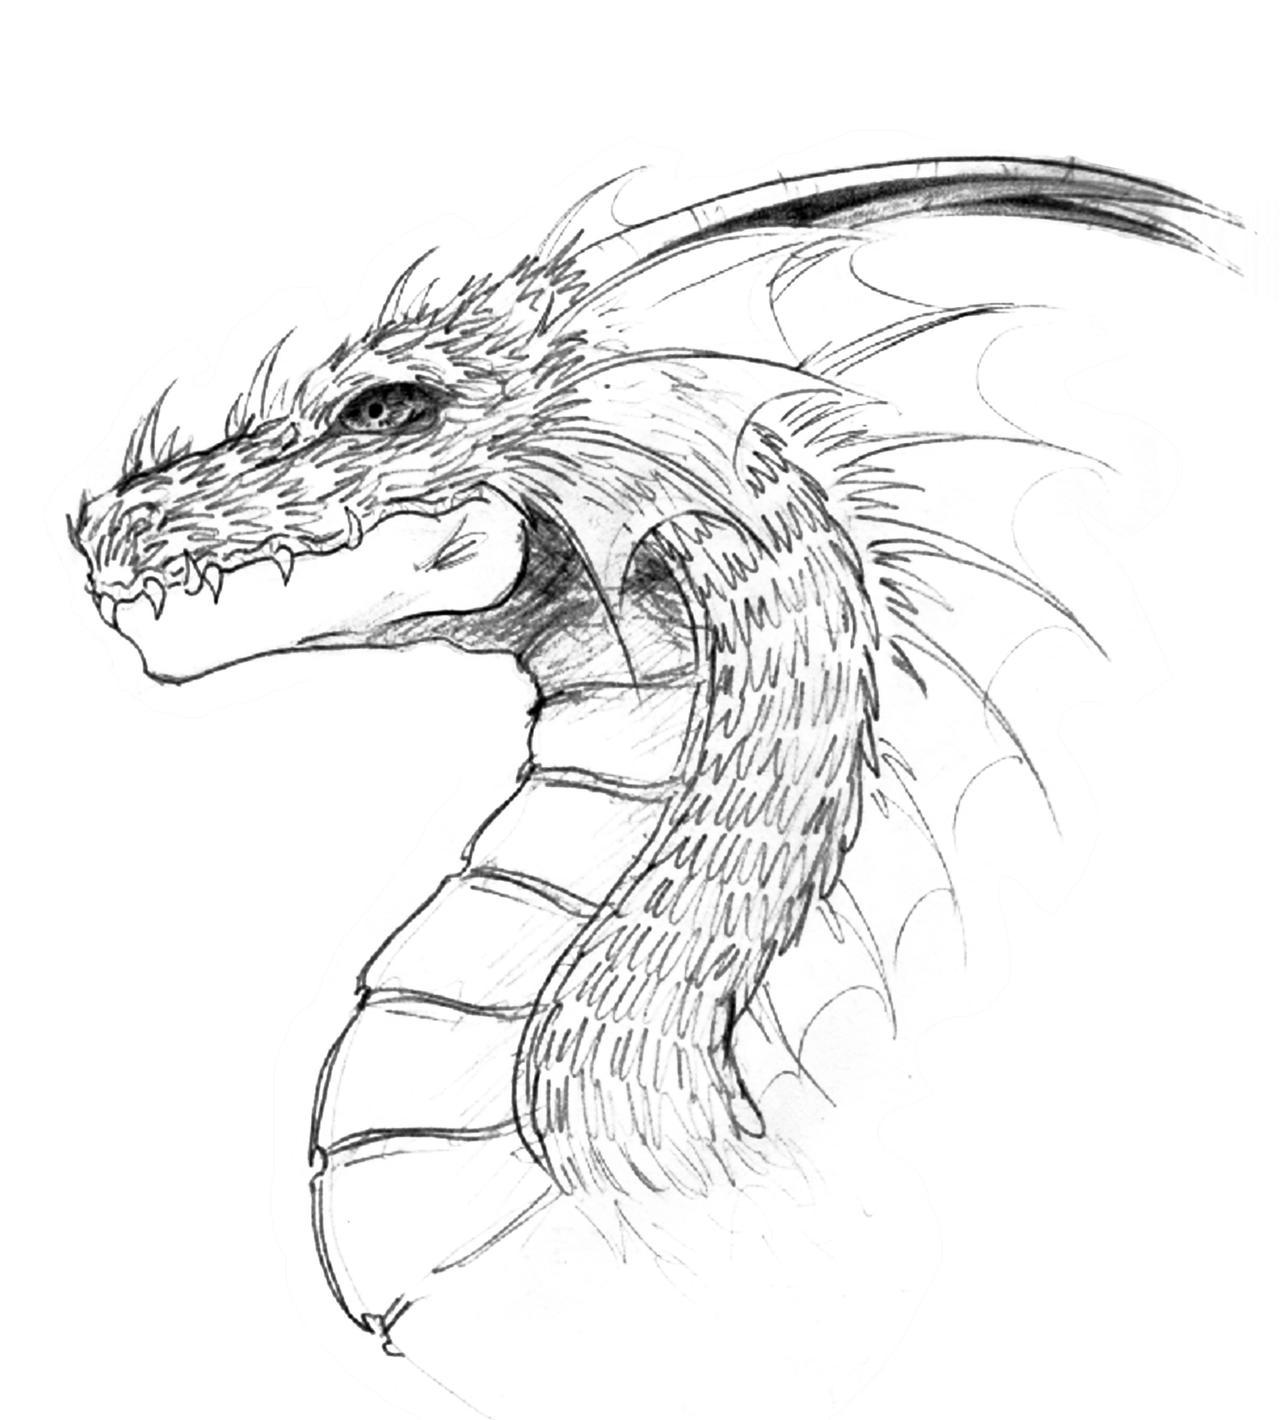 Dragon head by lastwarrior14 on DeviantArt